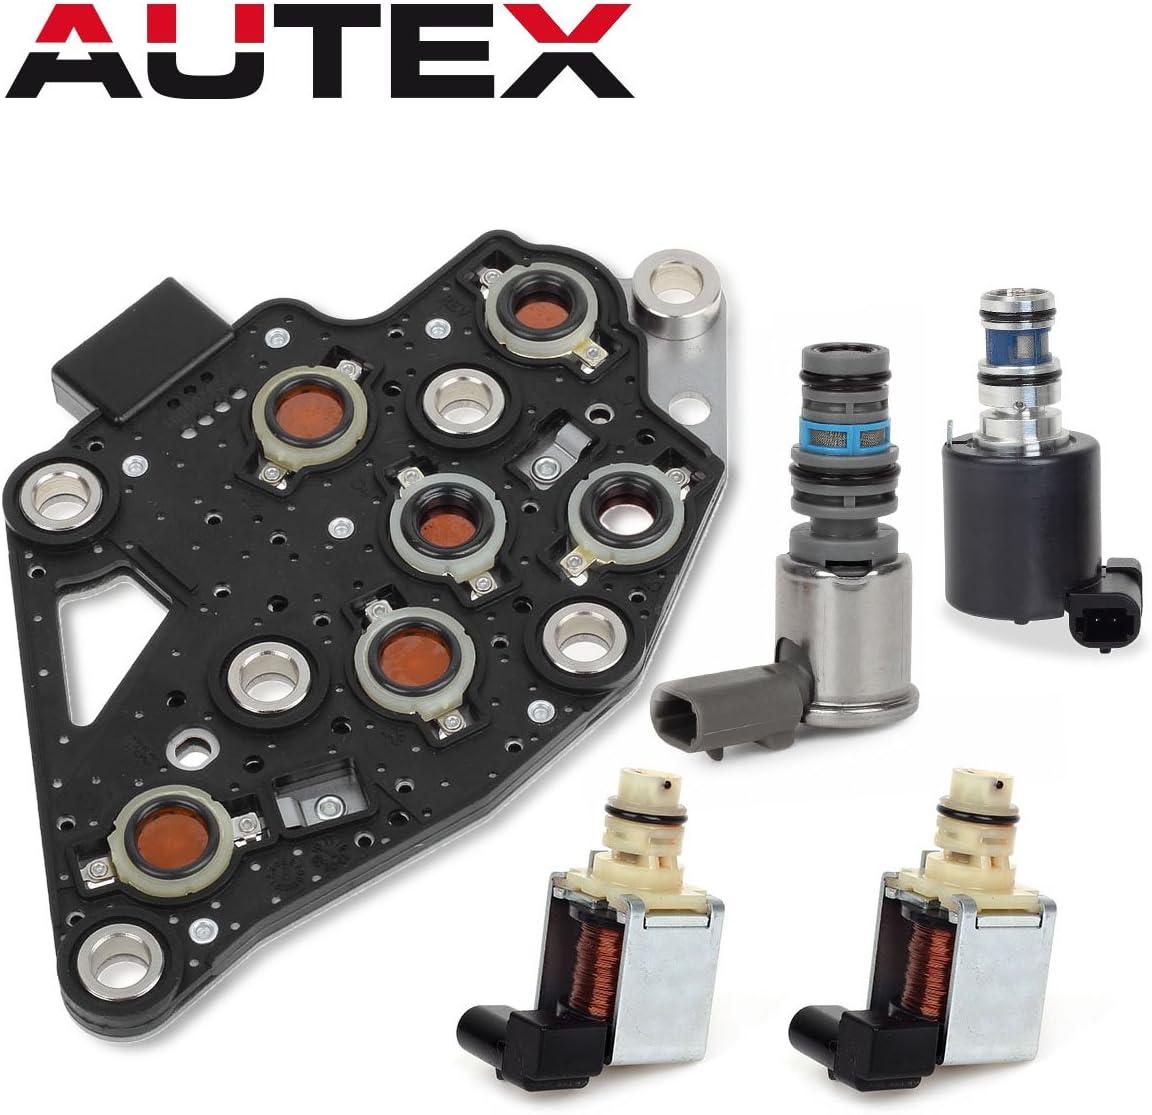 AUTEX 4T65E Automatic Transmission Master Shift Solenoids EPC TCC Manifold Pressure Switch Set Kit Compatible With Volvo Chevrolet GM 1997-2002 10478124 24219819